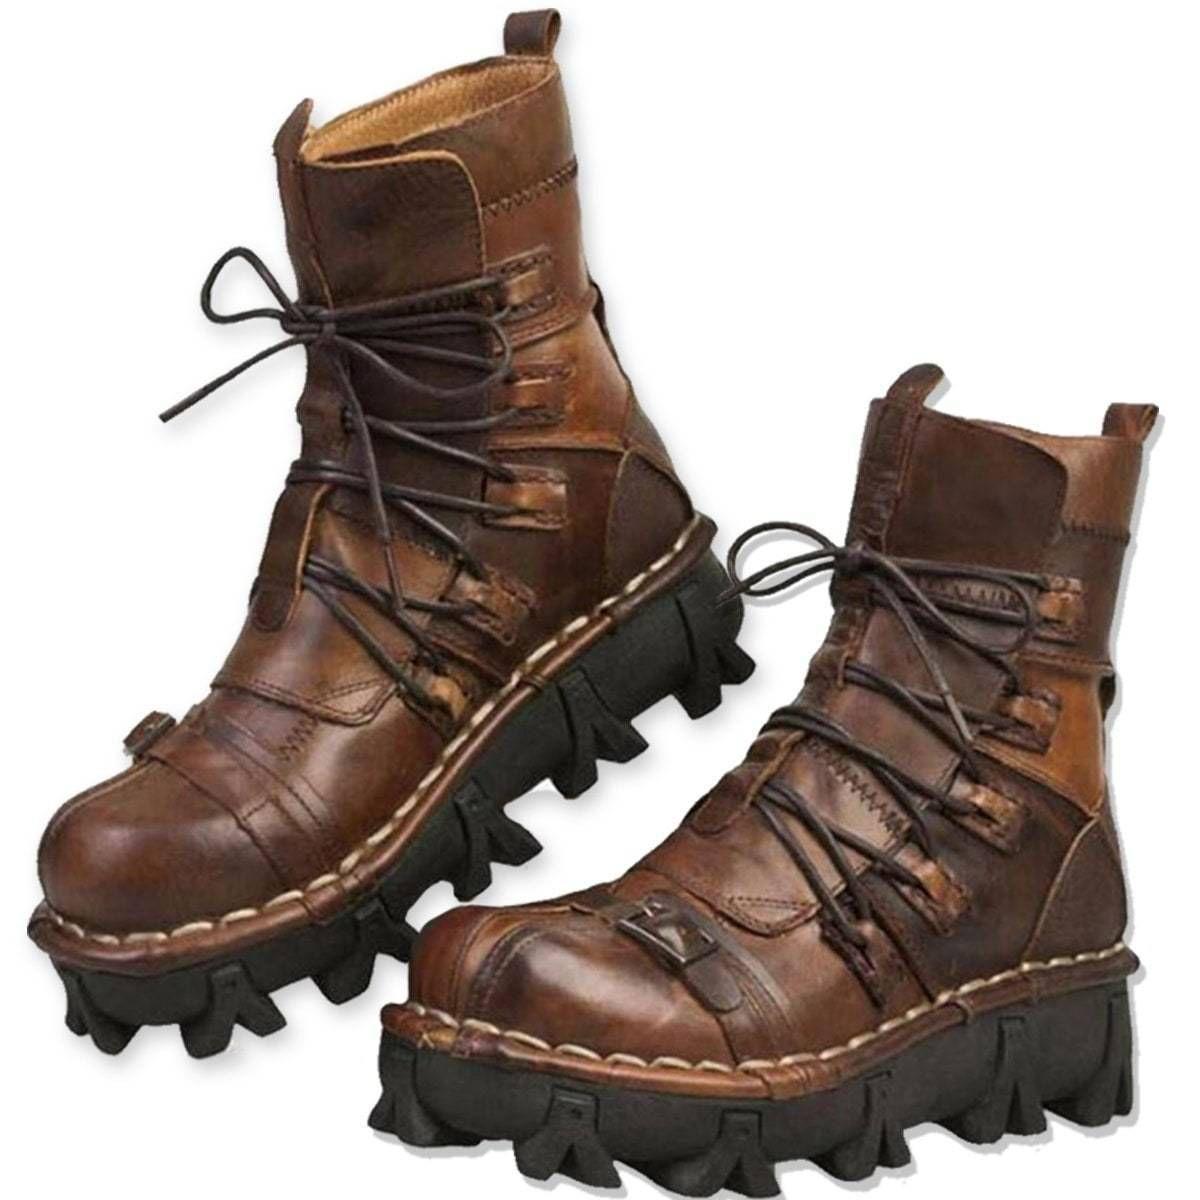 Badass Handmade Leather Boots, Size US